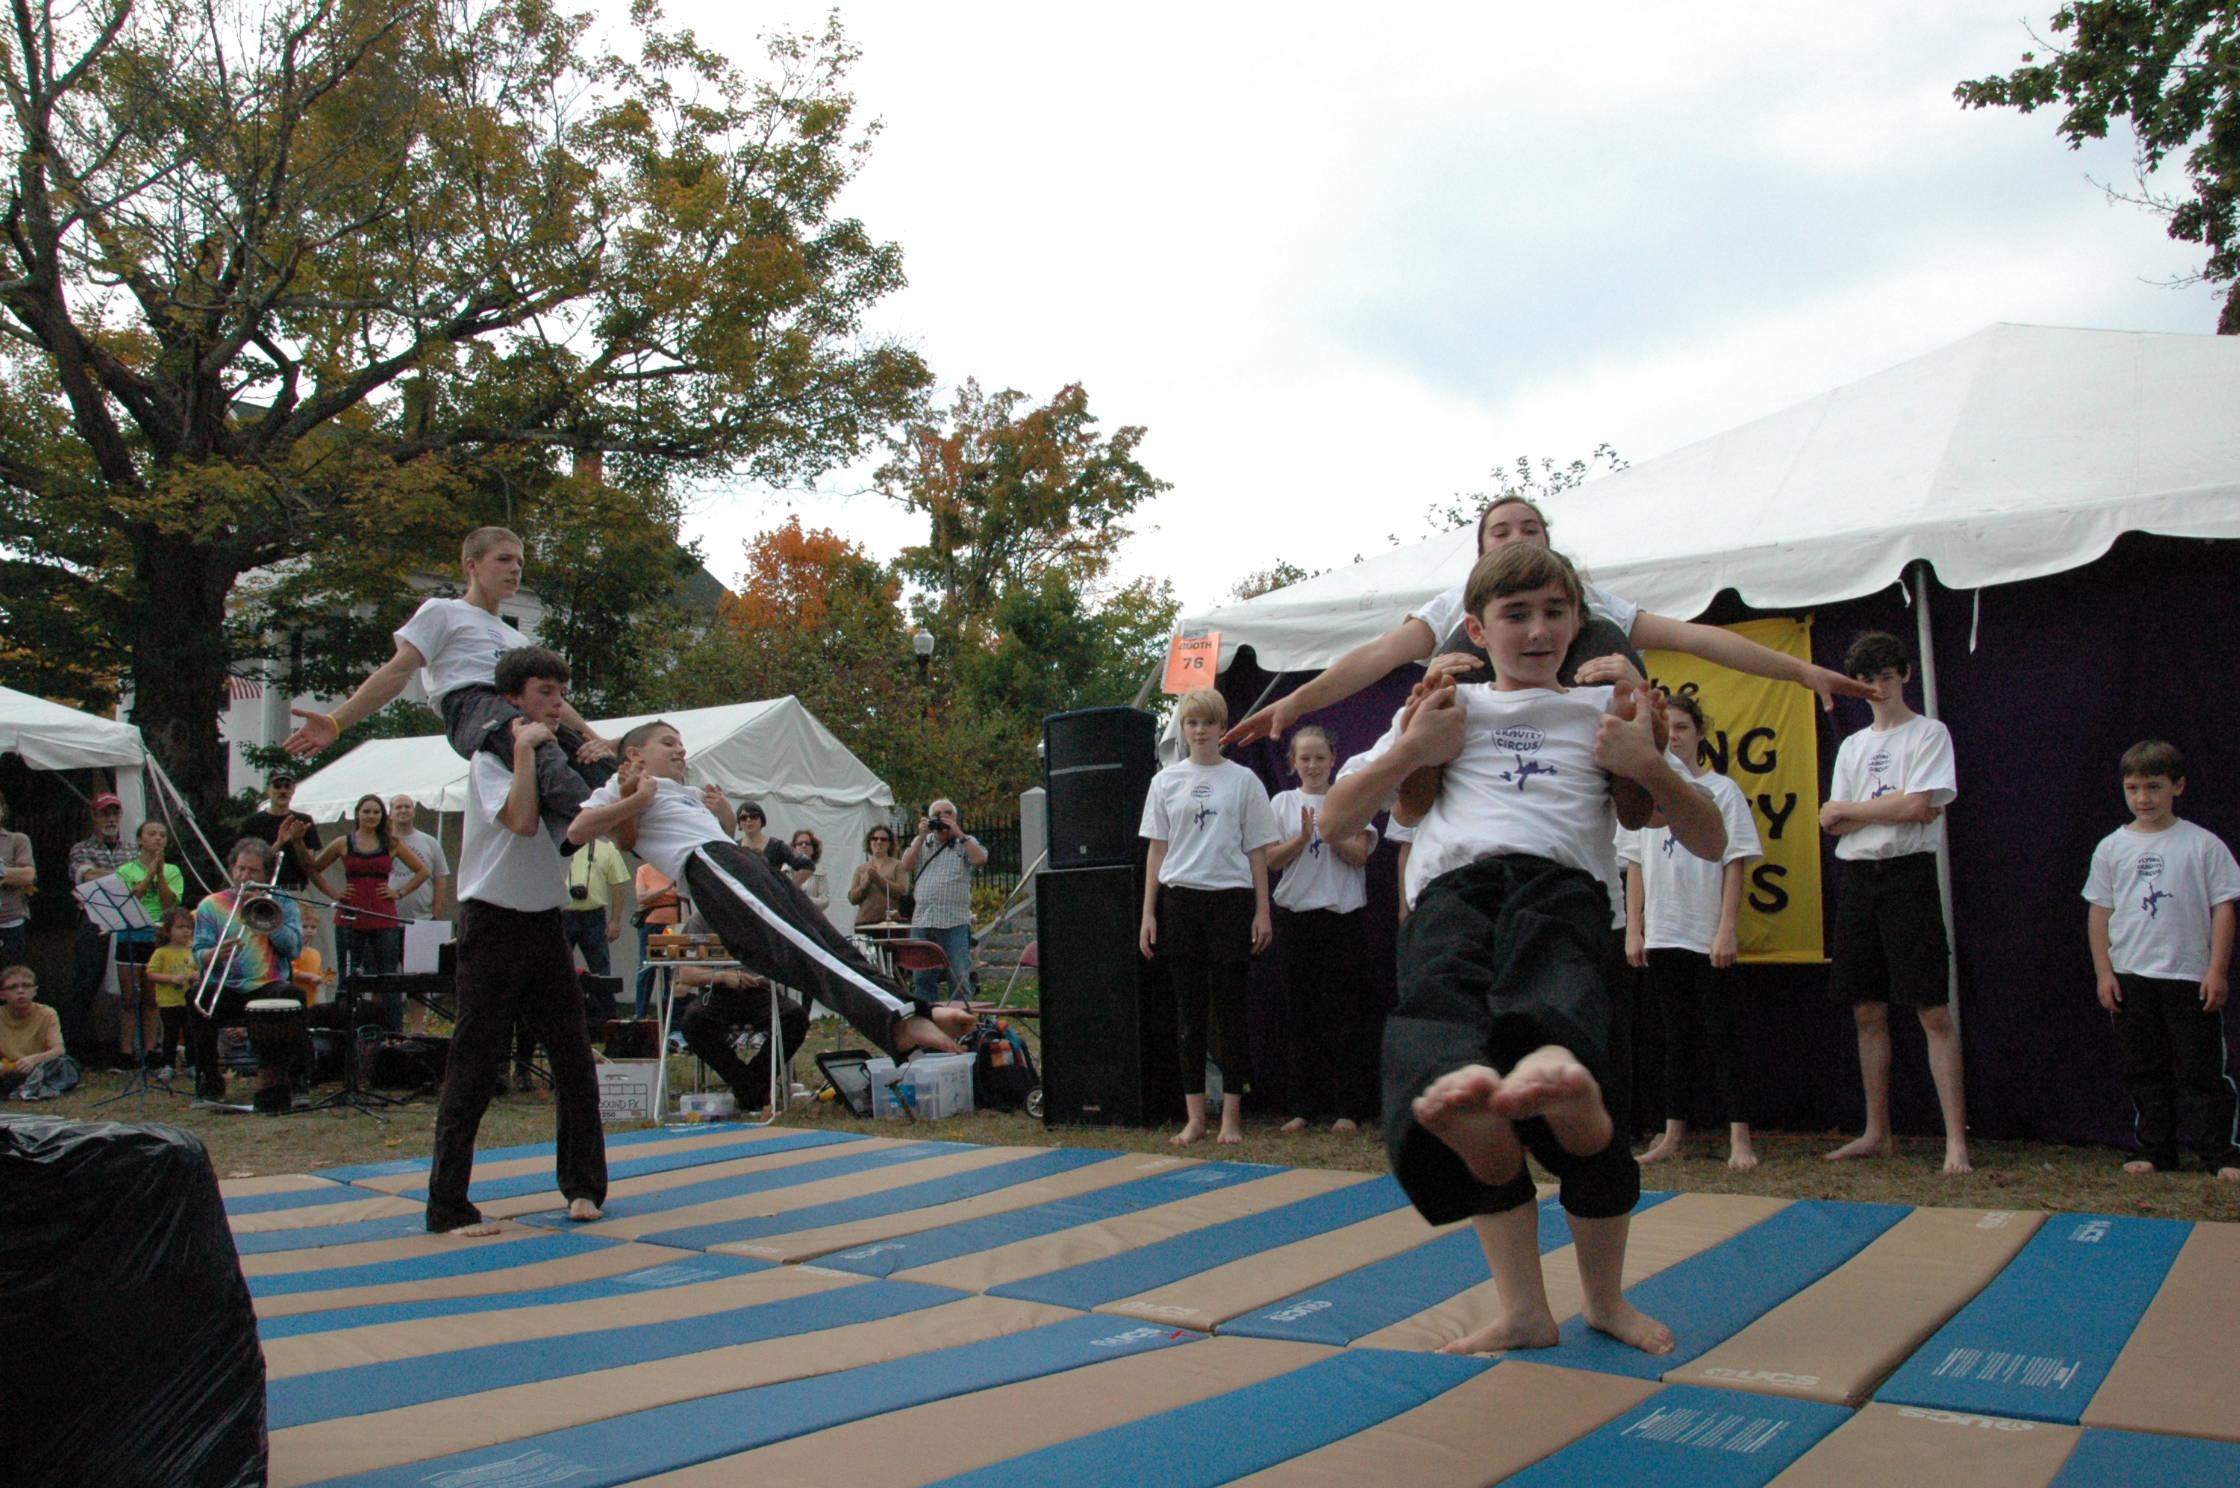 2012-10-06 Flyin Gravity Circus - Pumpkin 139.JPG